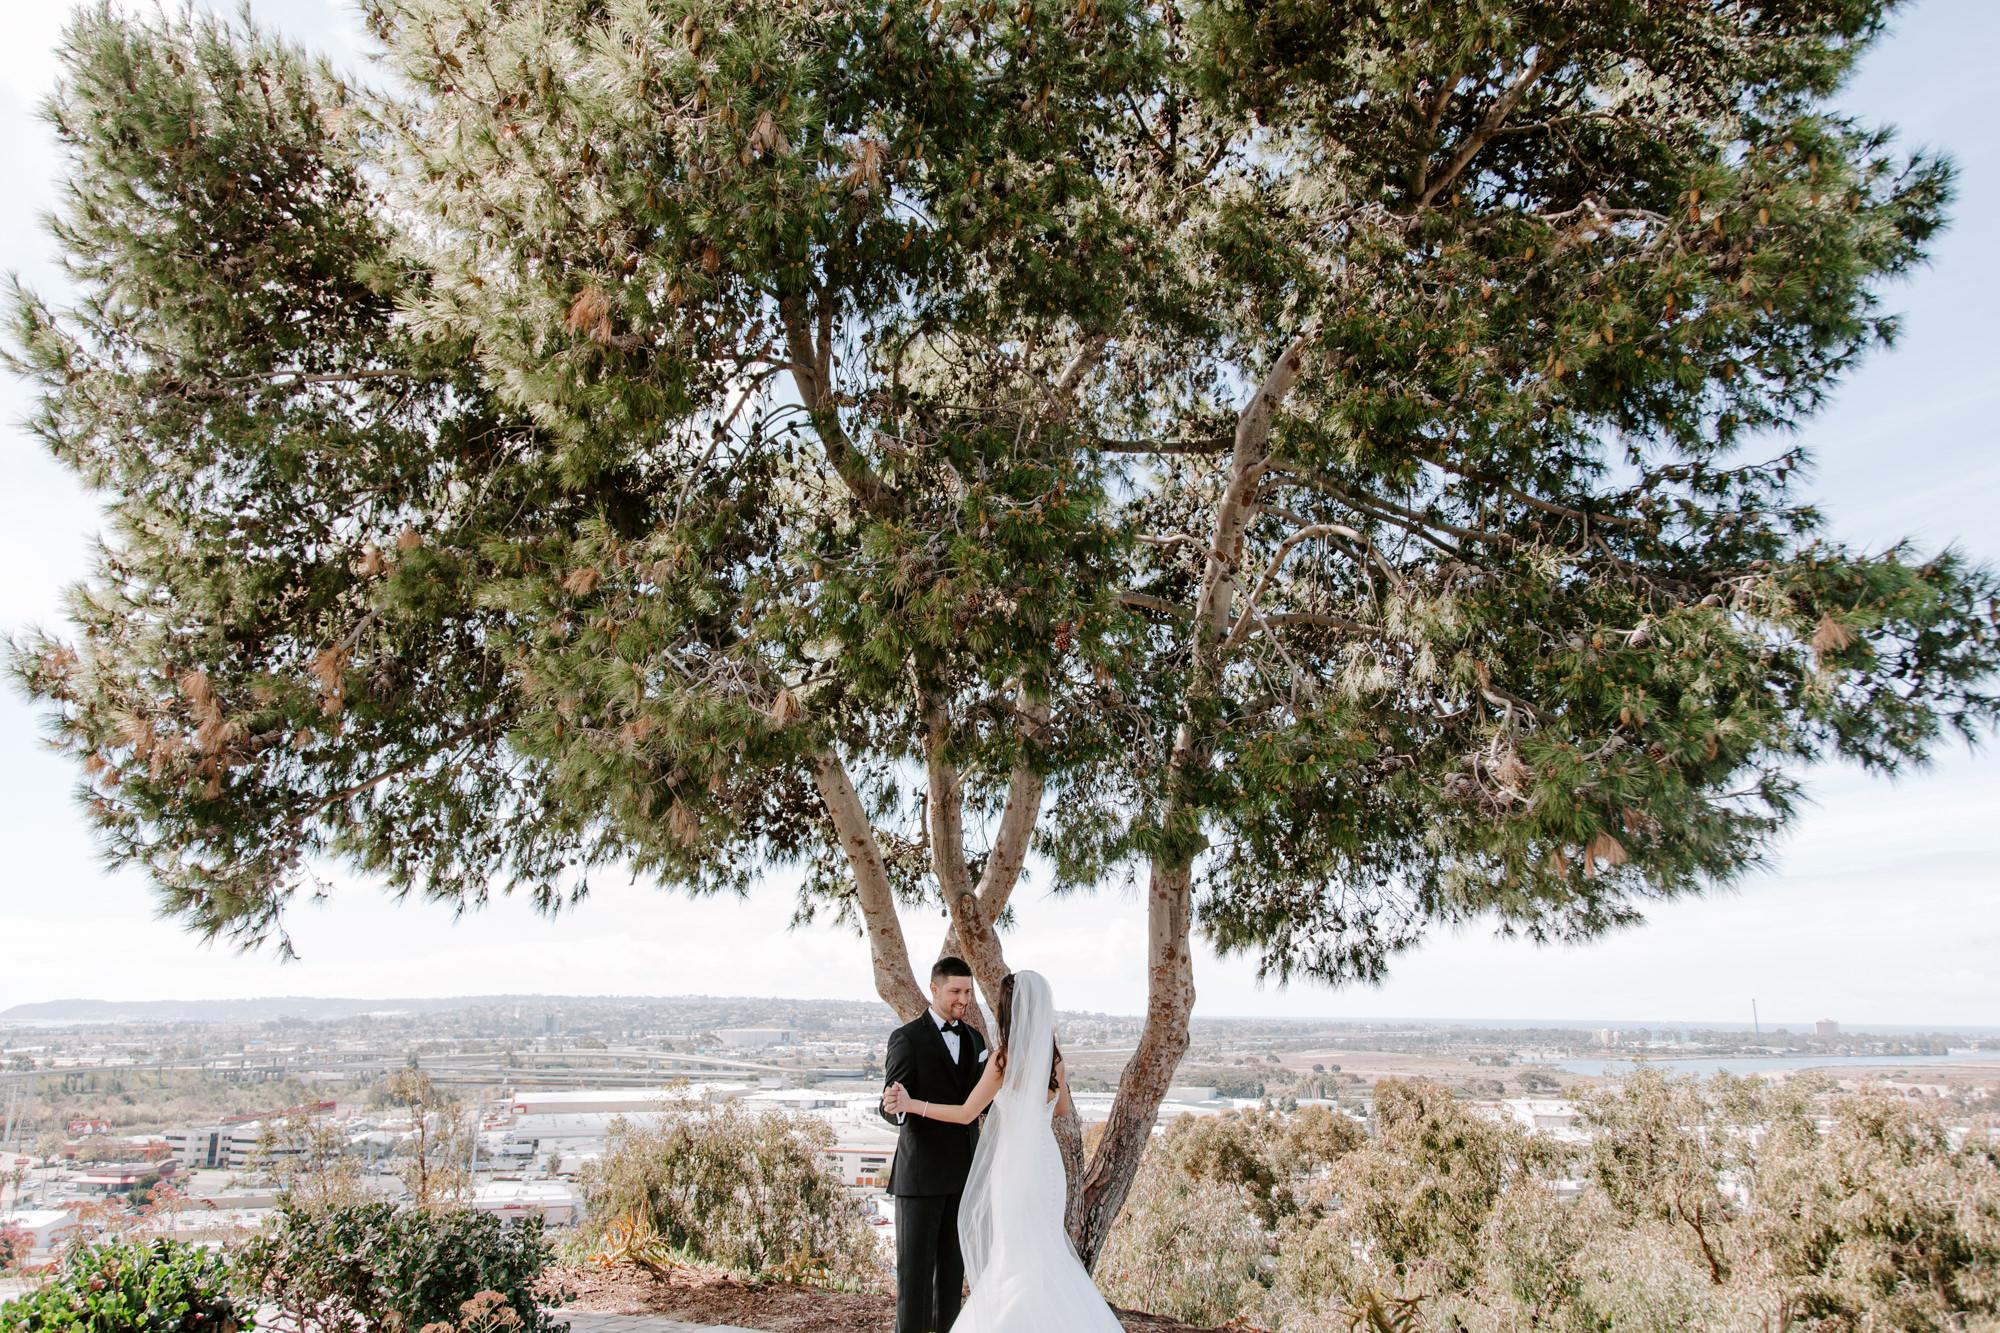 San Diego wedding photography at USD Immaculata 011.jpg